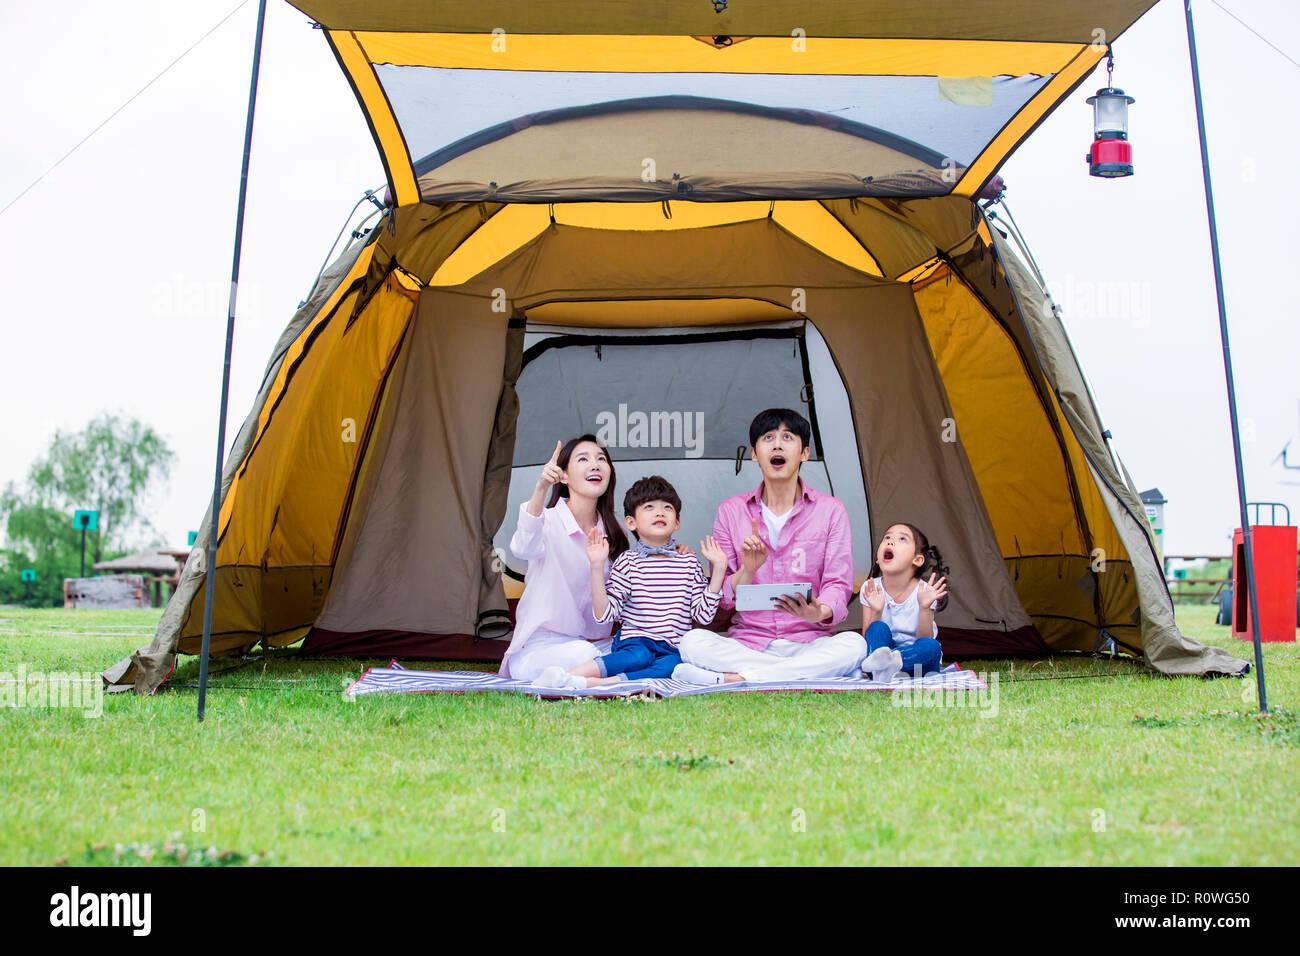 Picnic Tent Stockfotos Picnic Tent Bilder Seite 7 Alamy